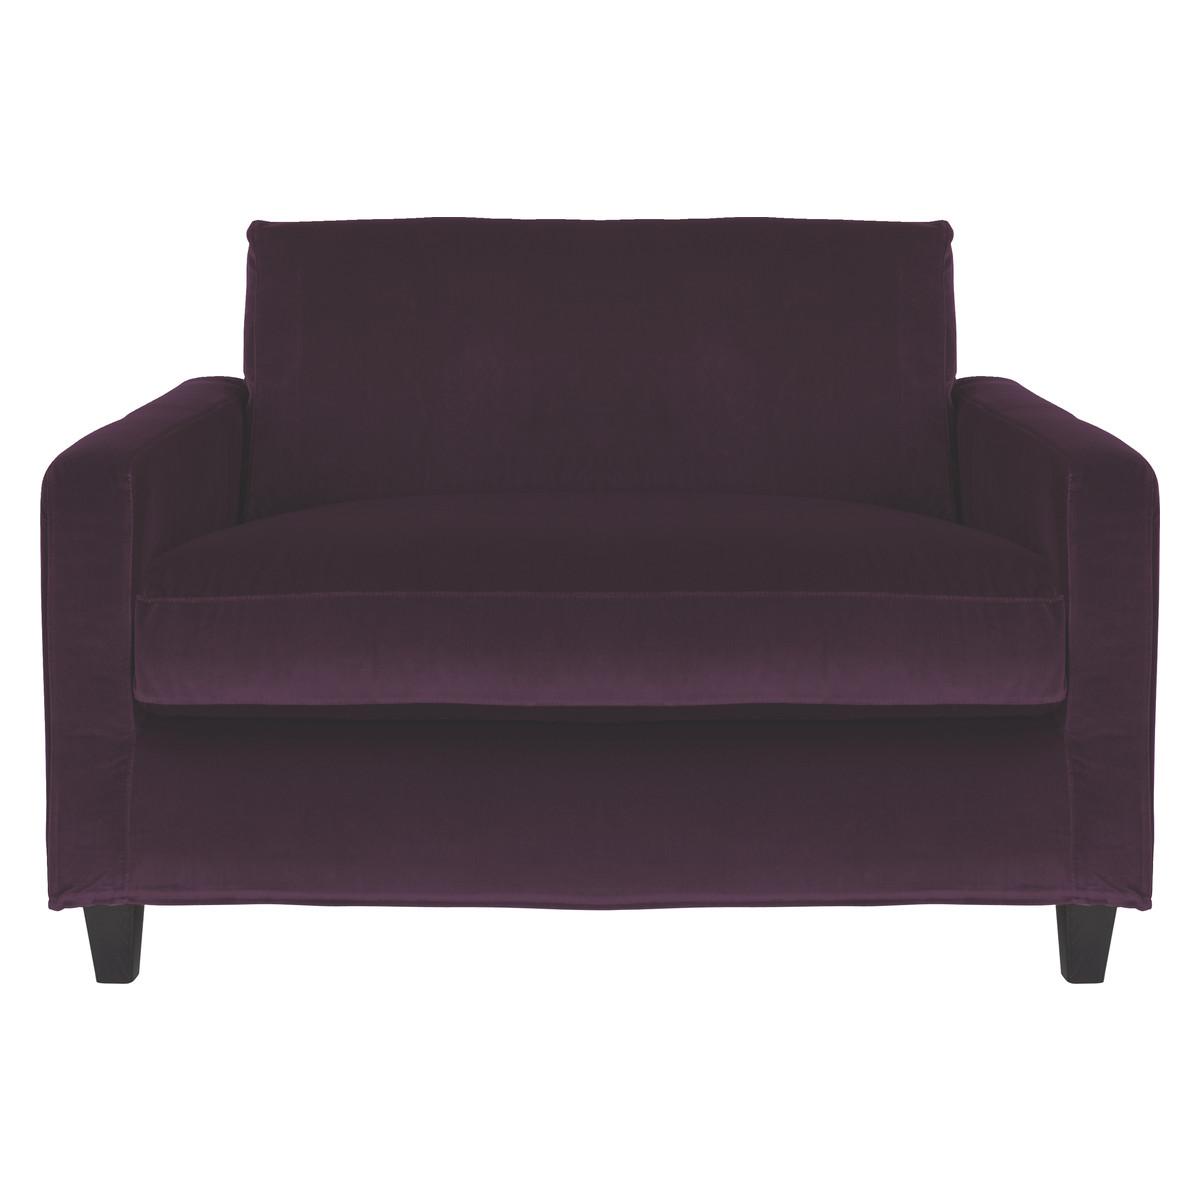 habitat chester sofa leather 70 bed purple velvet compact dark stained